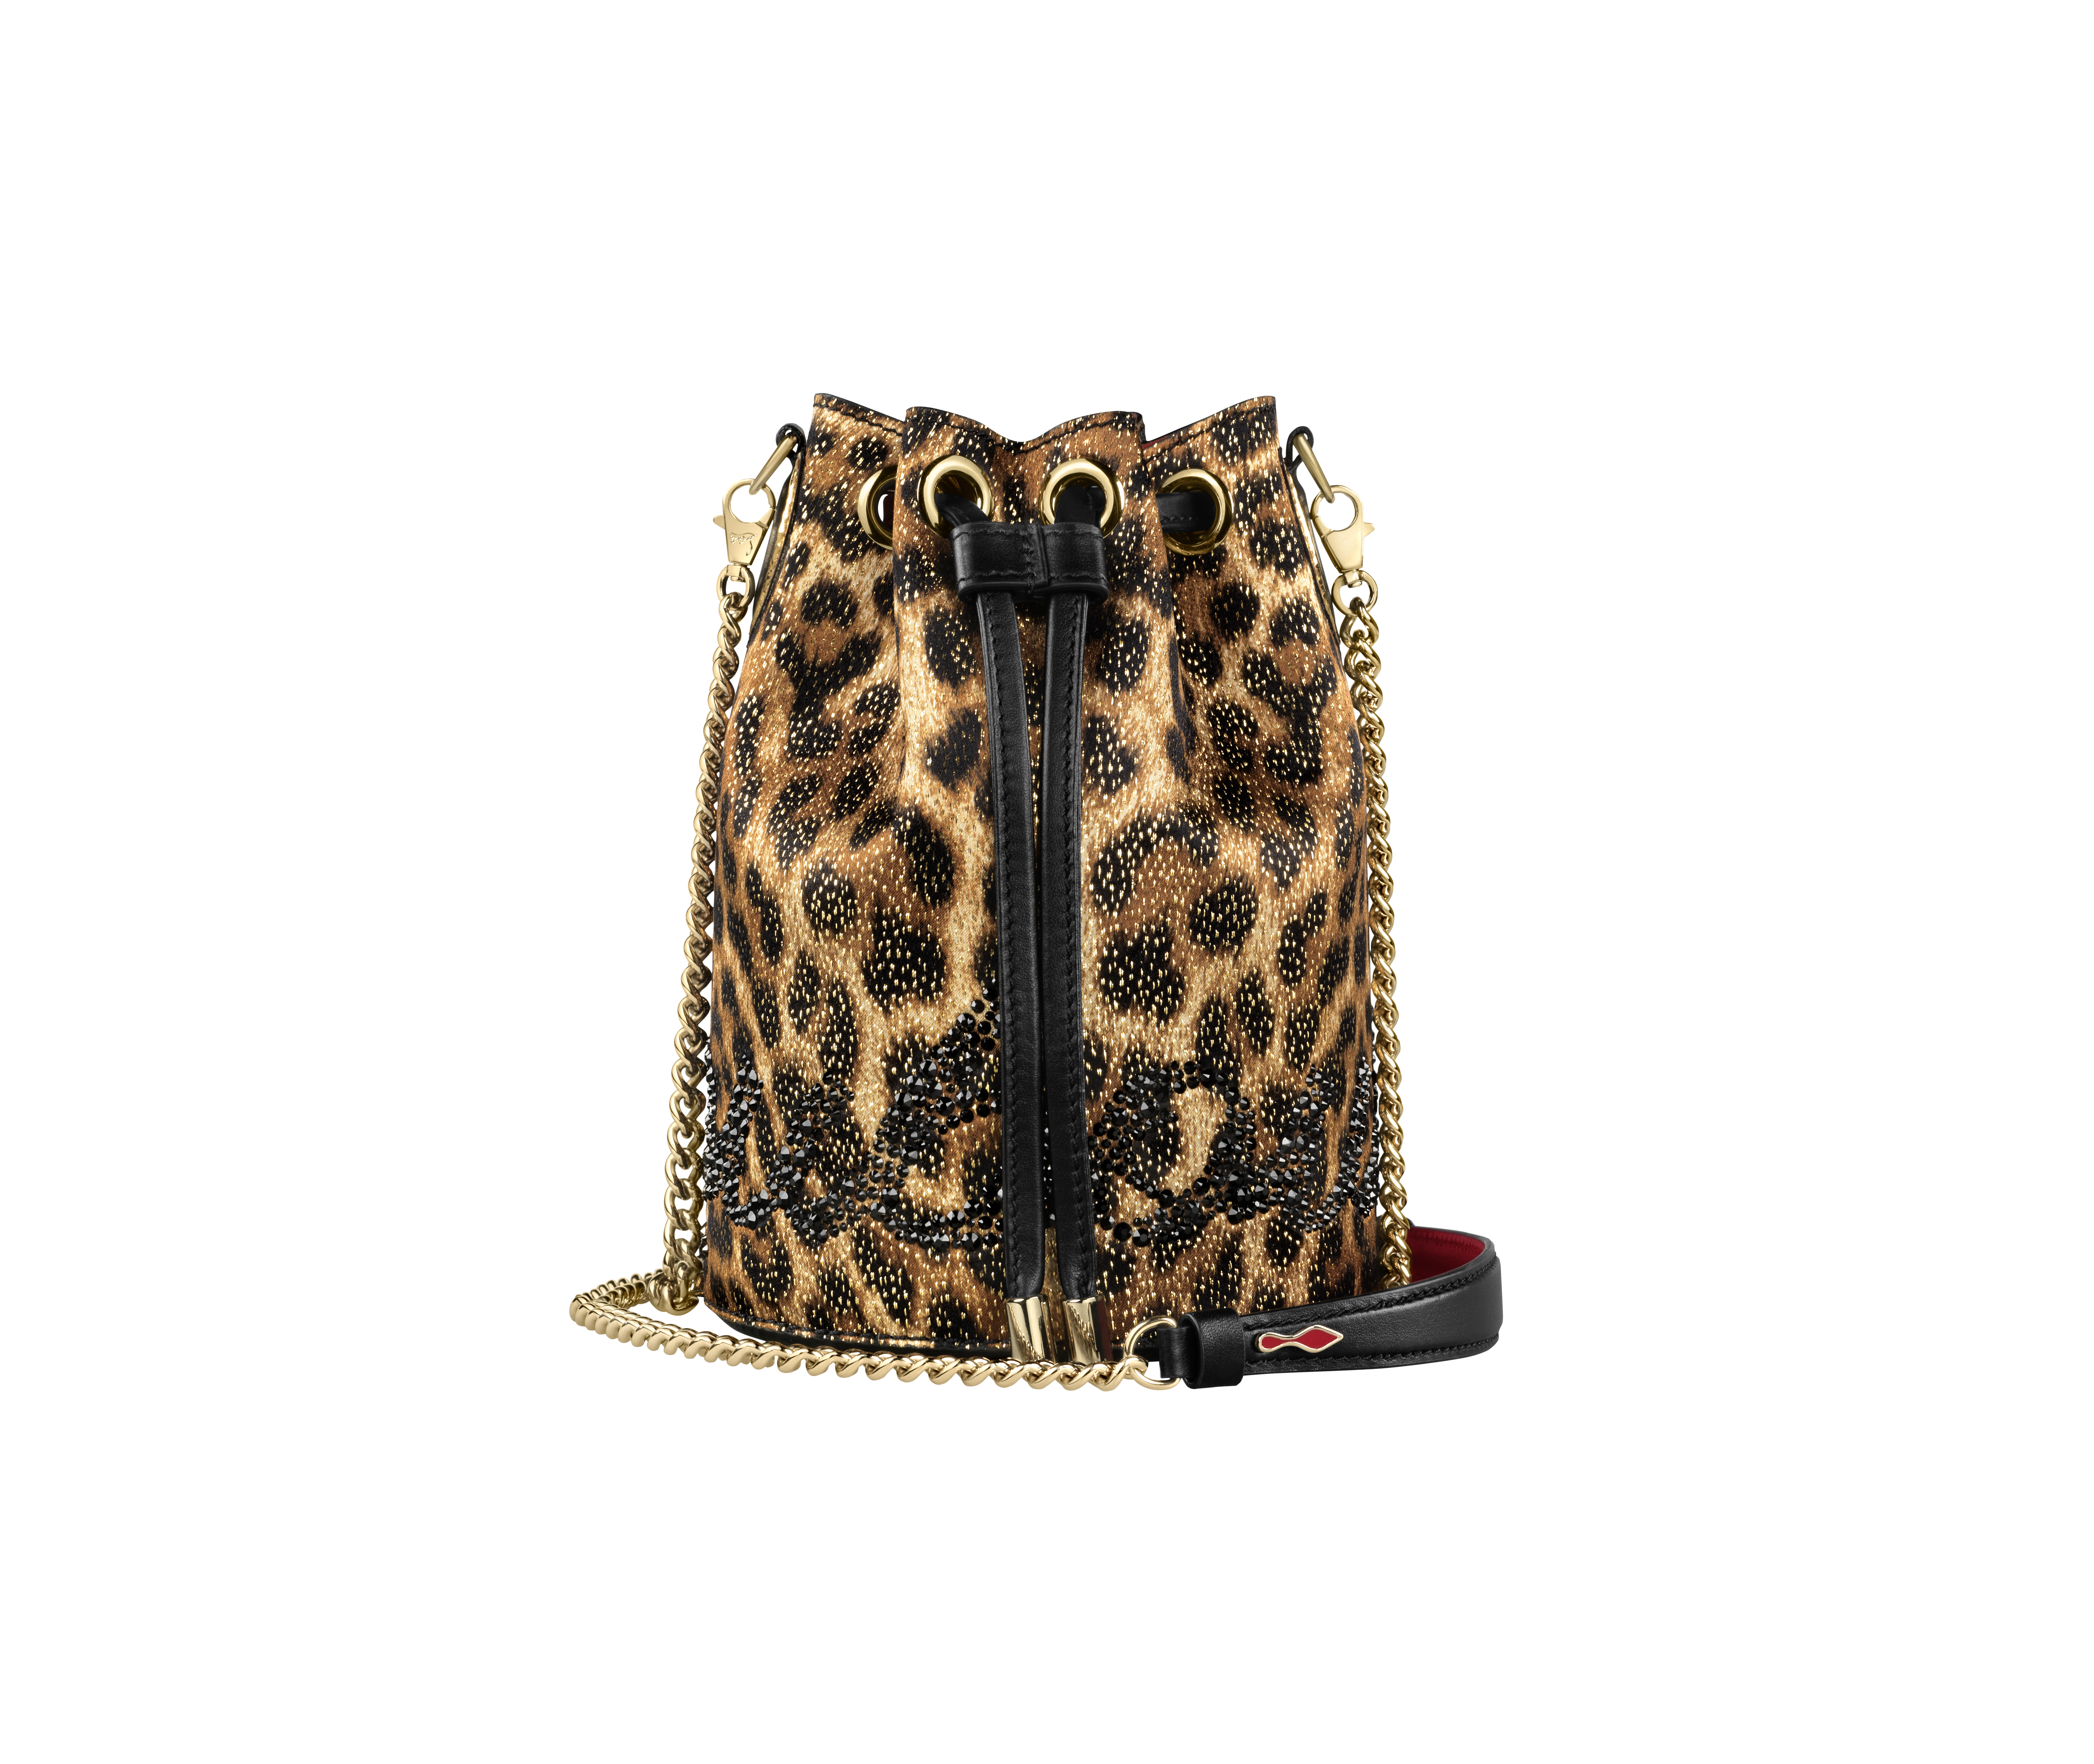 1295af670a5 Christian Louboutin SS-19 Marie Jane Handbag Collection: Details